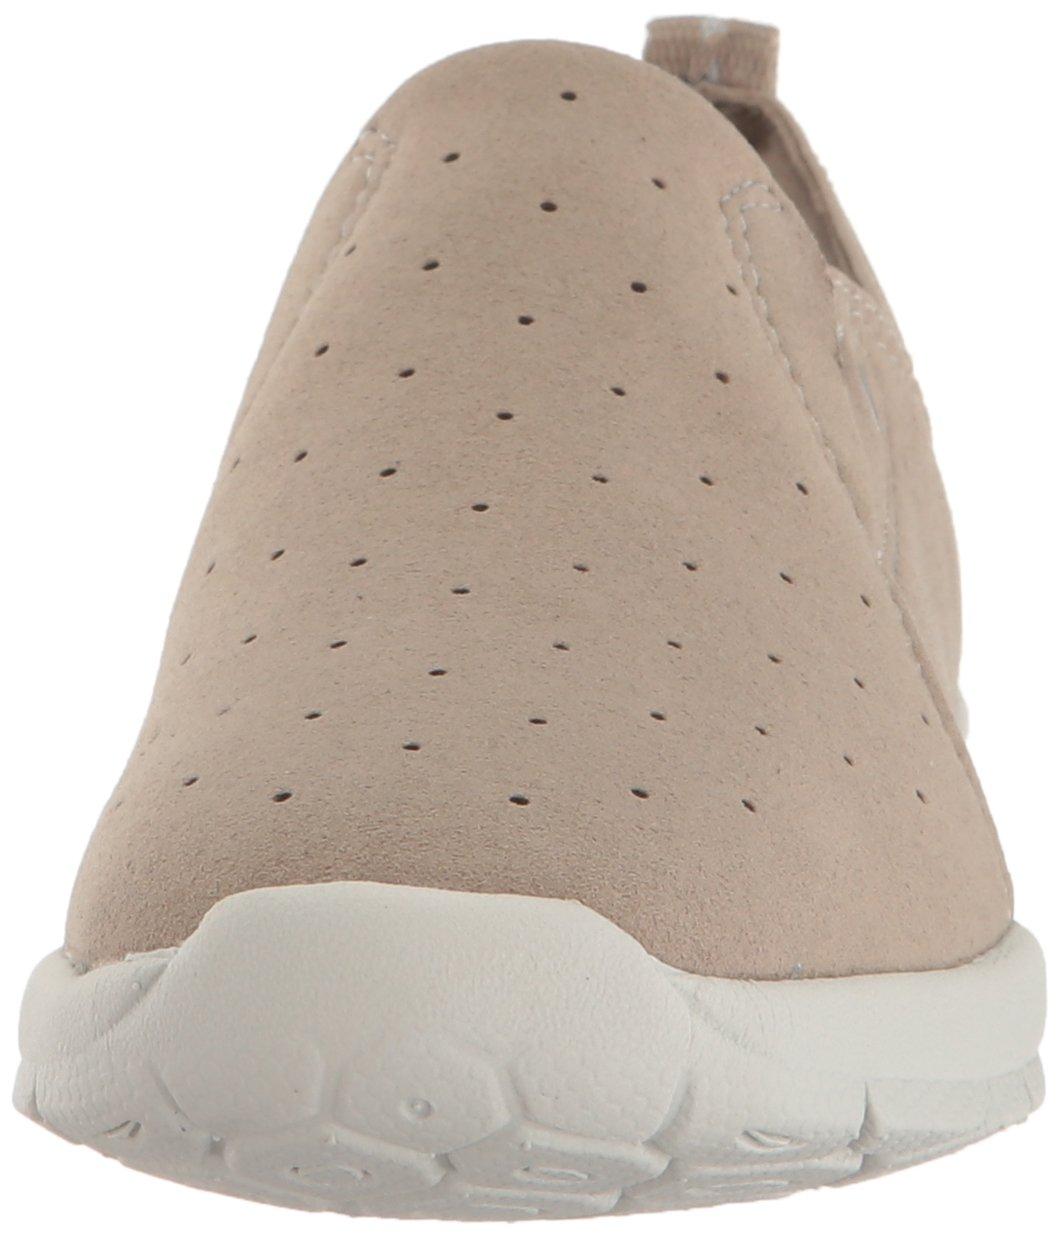 Easy Spirit Women's Getflex2 Fashion Sneaker Fabric B01MXE6DIP 8.5 B(M) US|Natural/Natural Fabric Sneaker 7cd64d